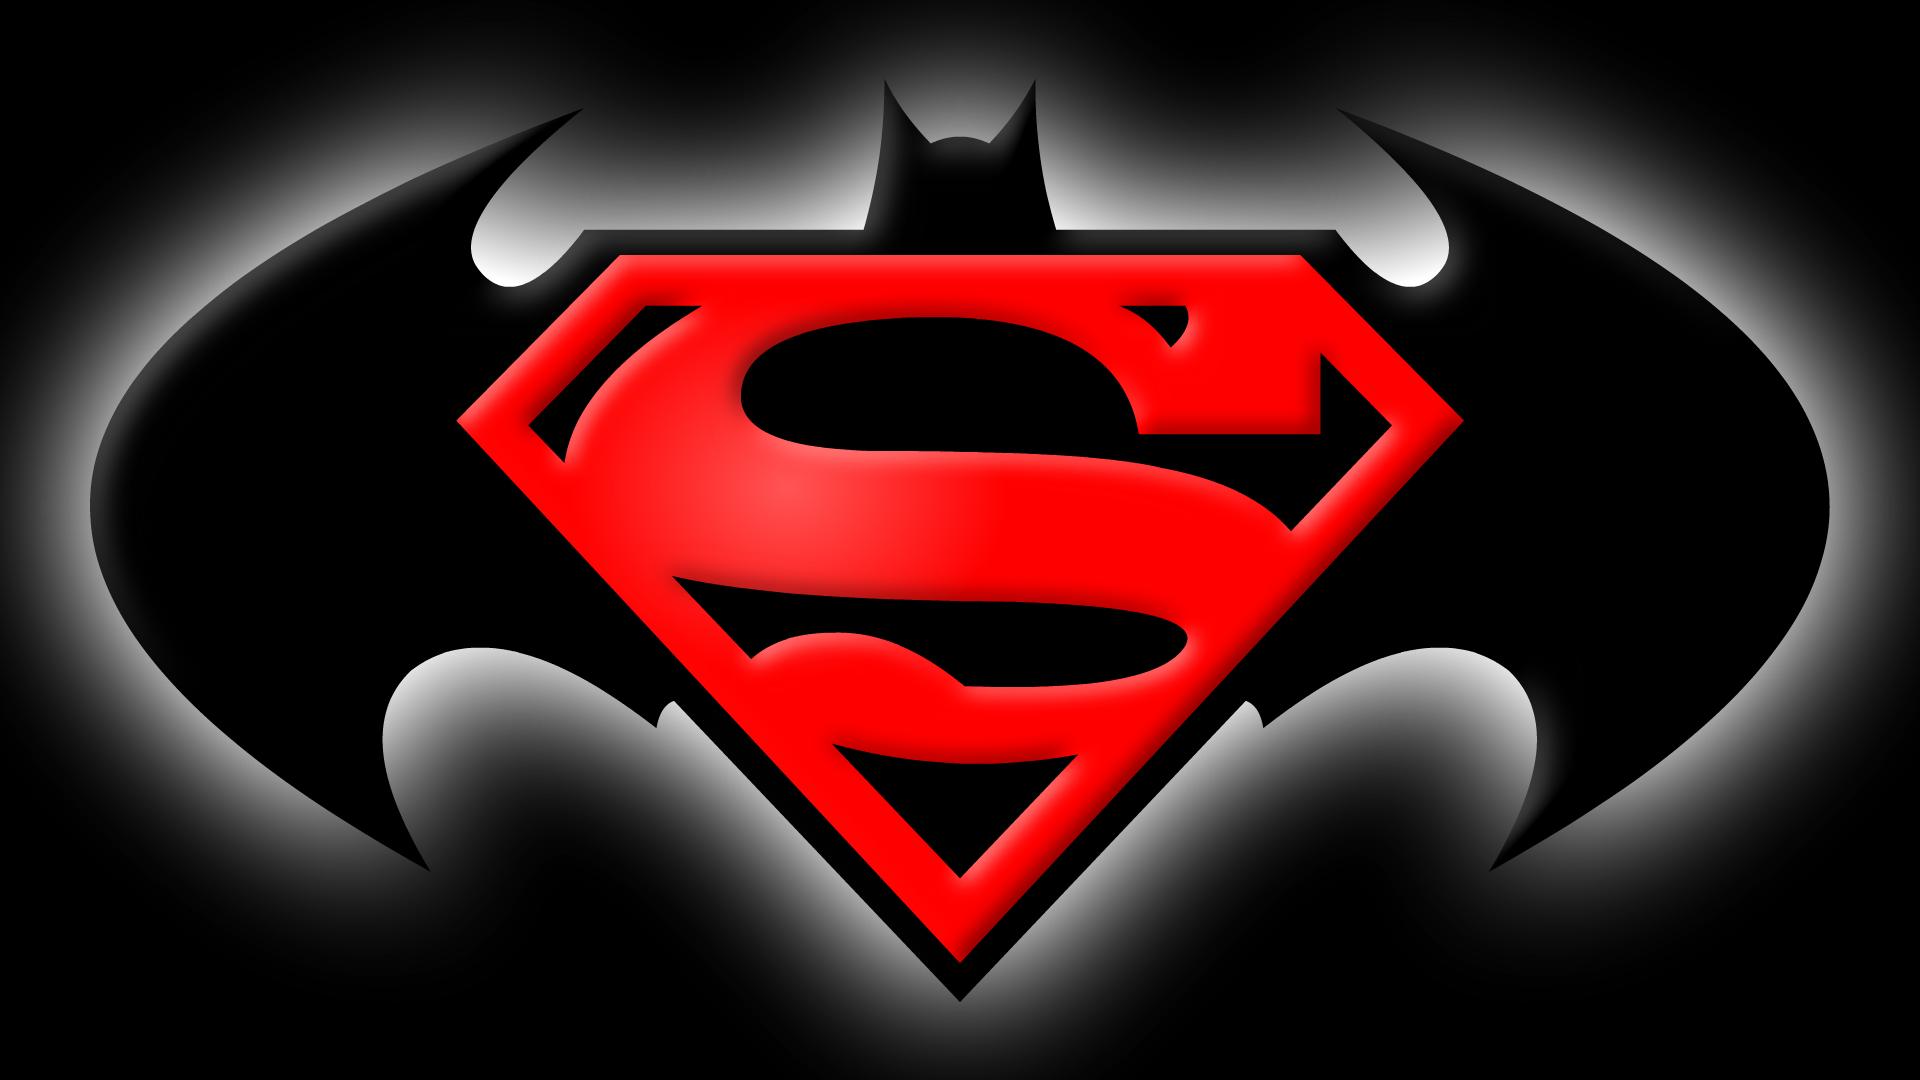 supermanbatman symbol by yurtigo on deviantart